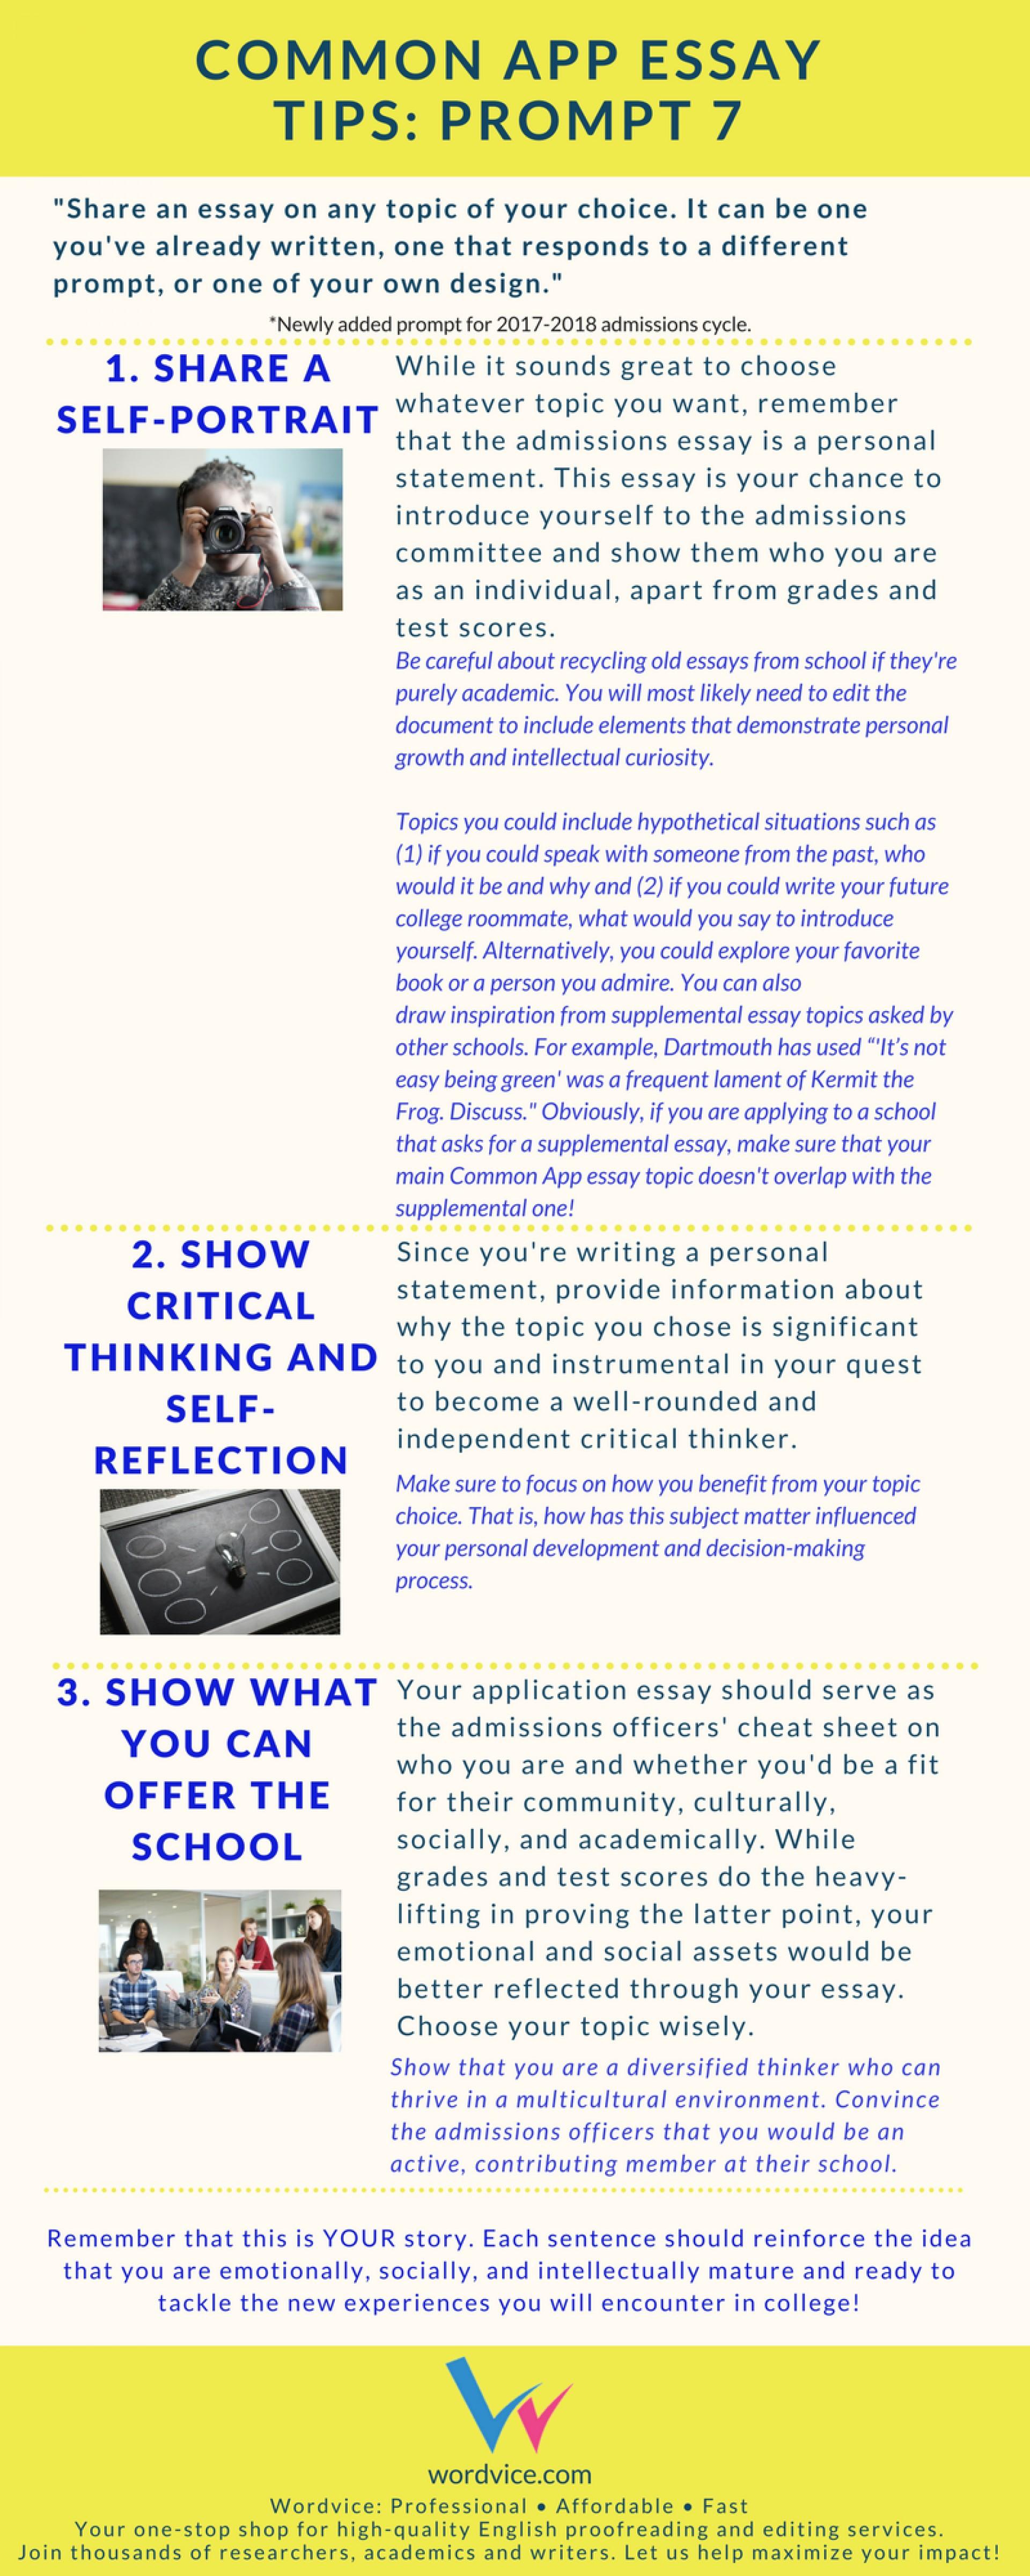 011 Common App Brainstormprompt Essay Questions Dreaded 2017 2017-18 1920